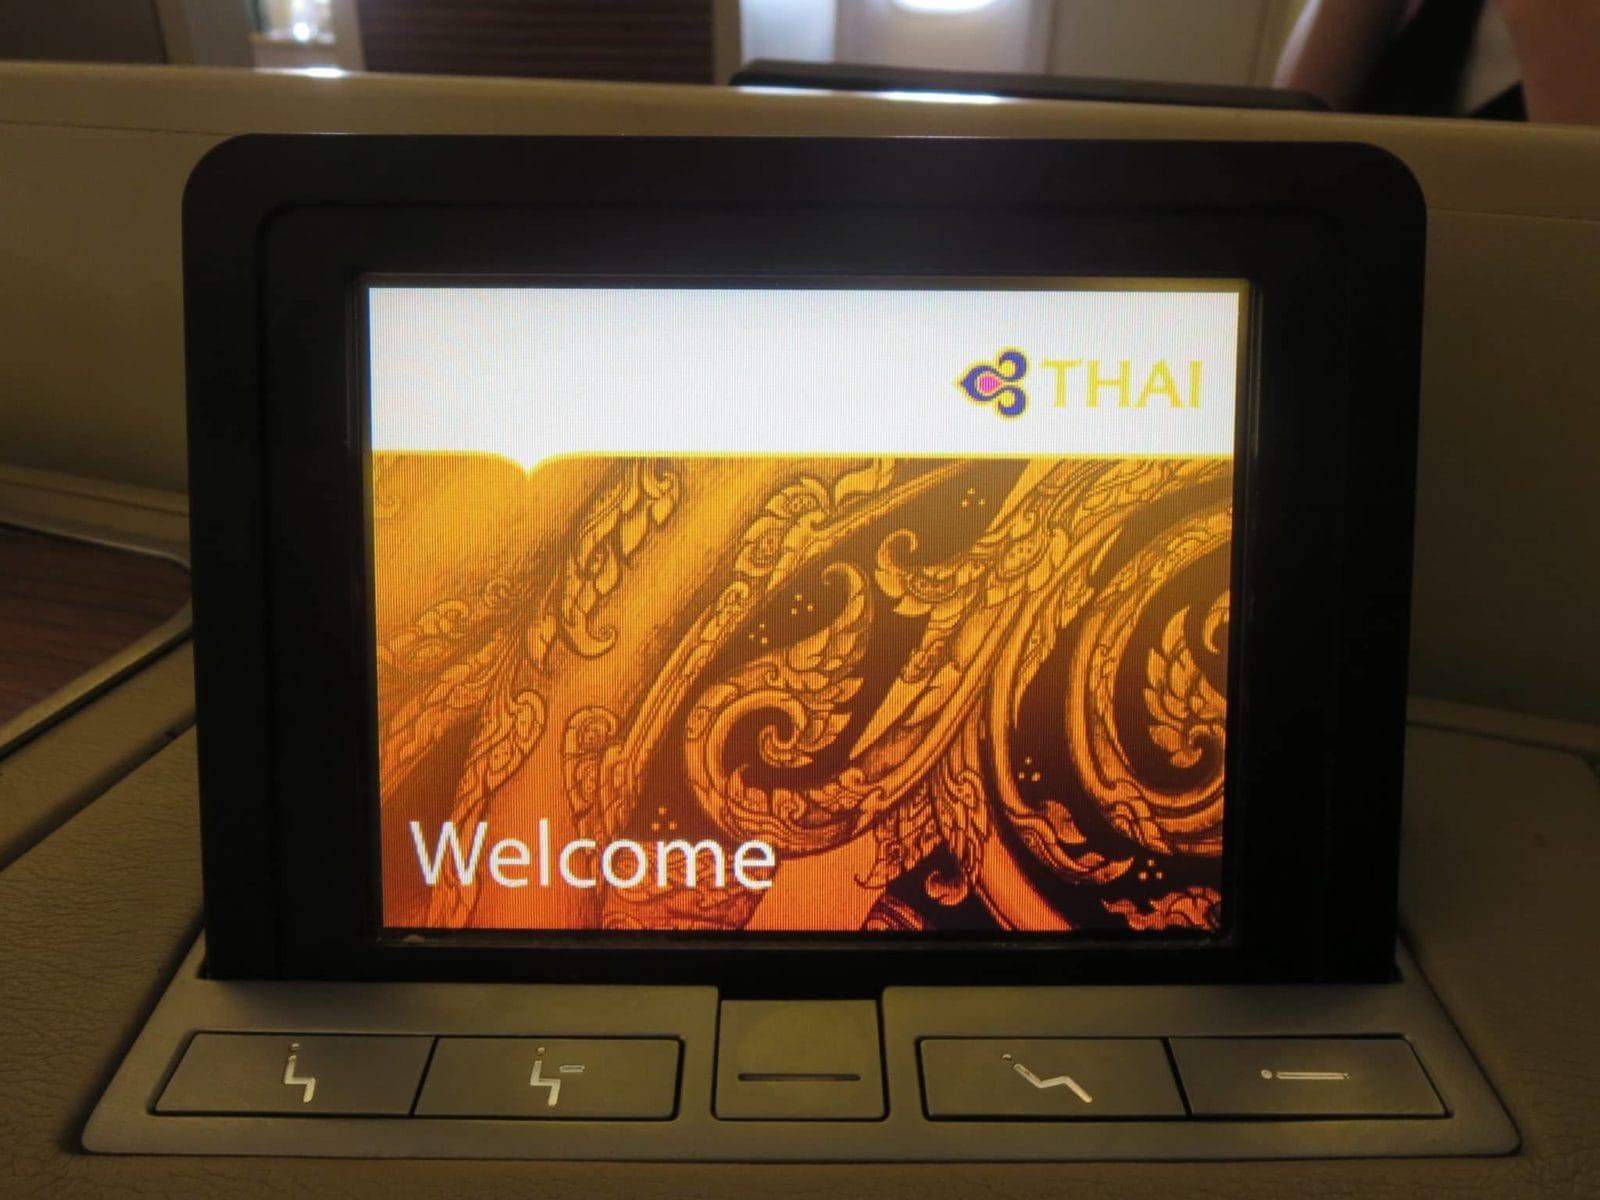 Thai Airways First Class Boeing 747 Touchscreen